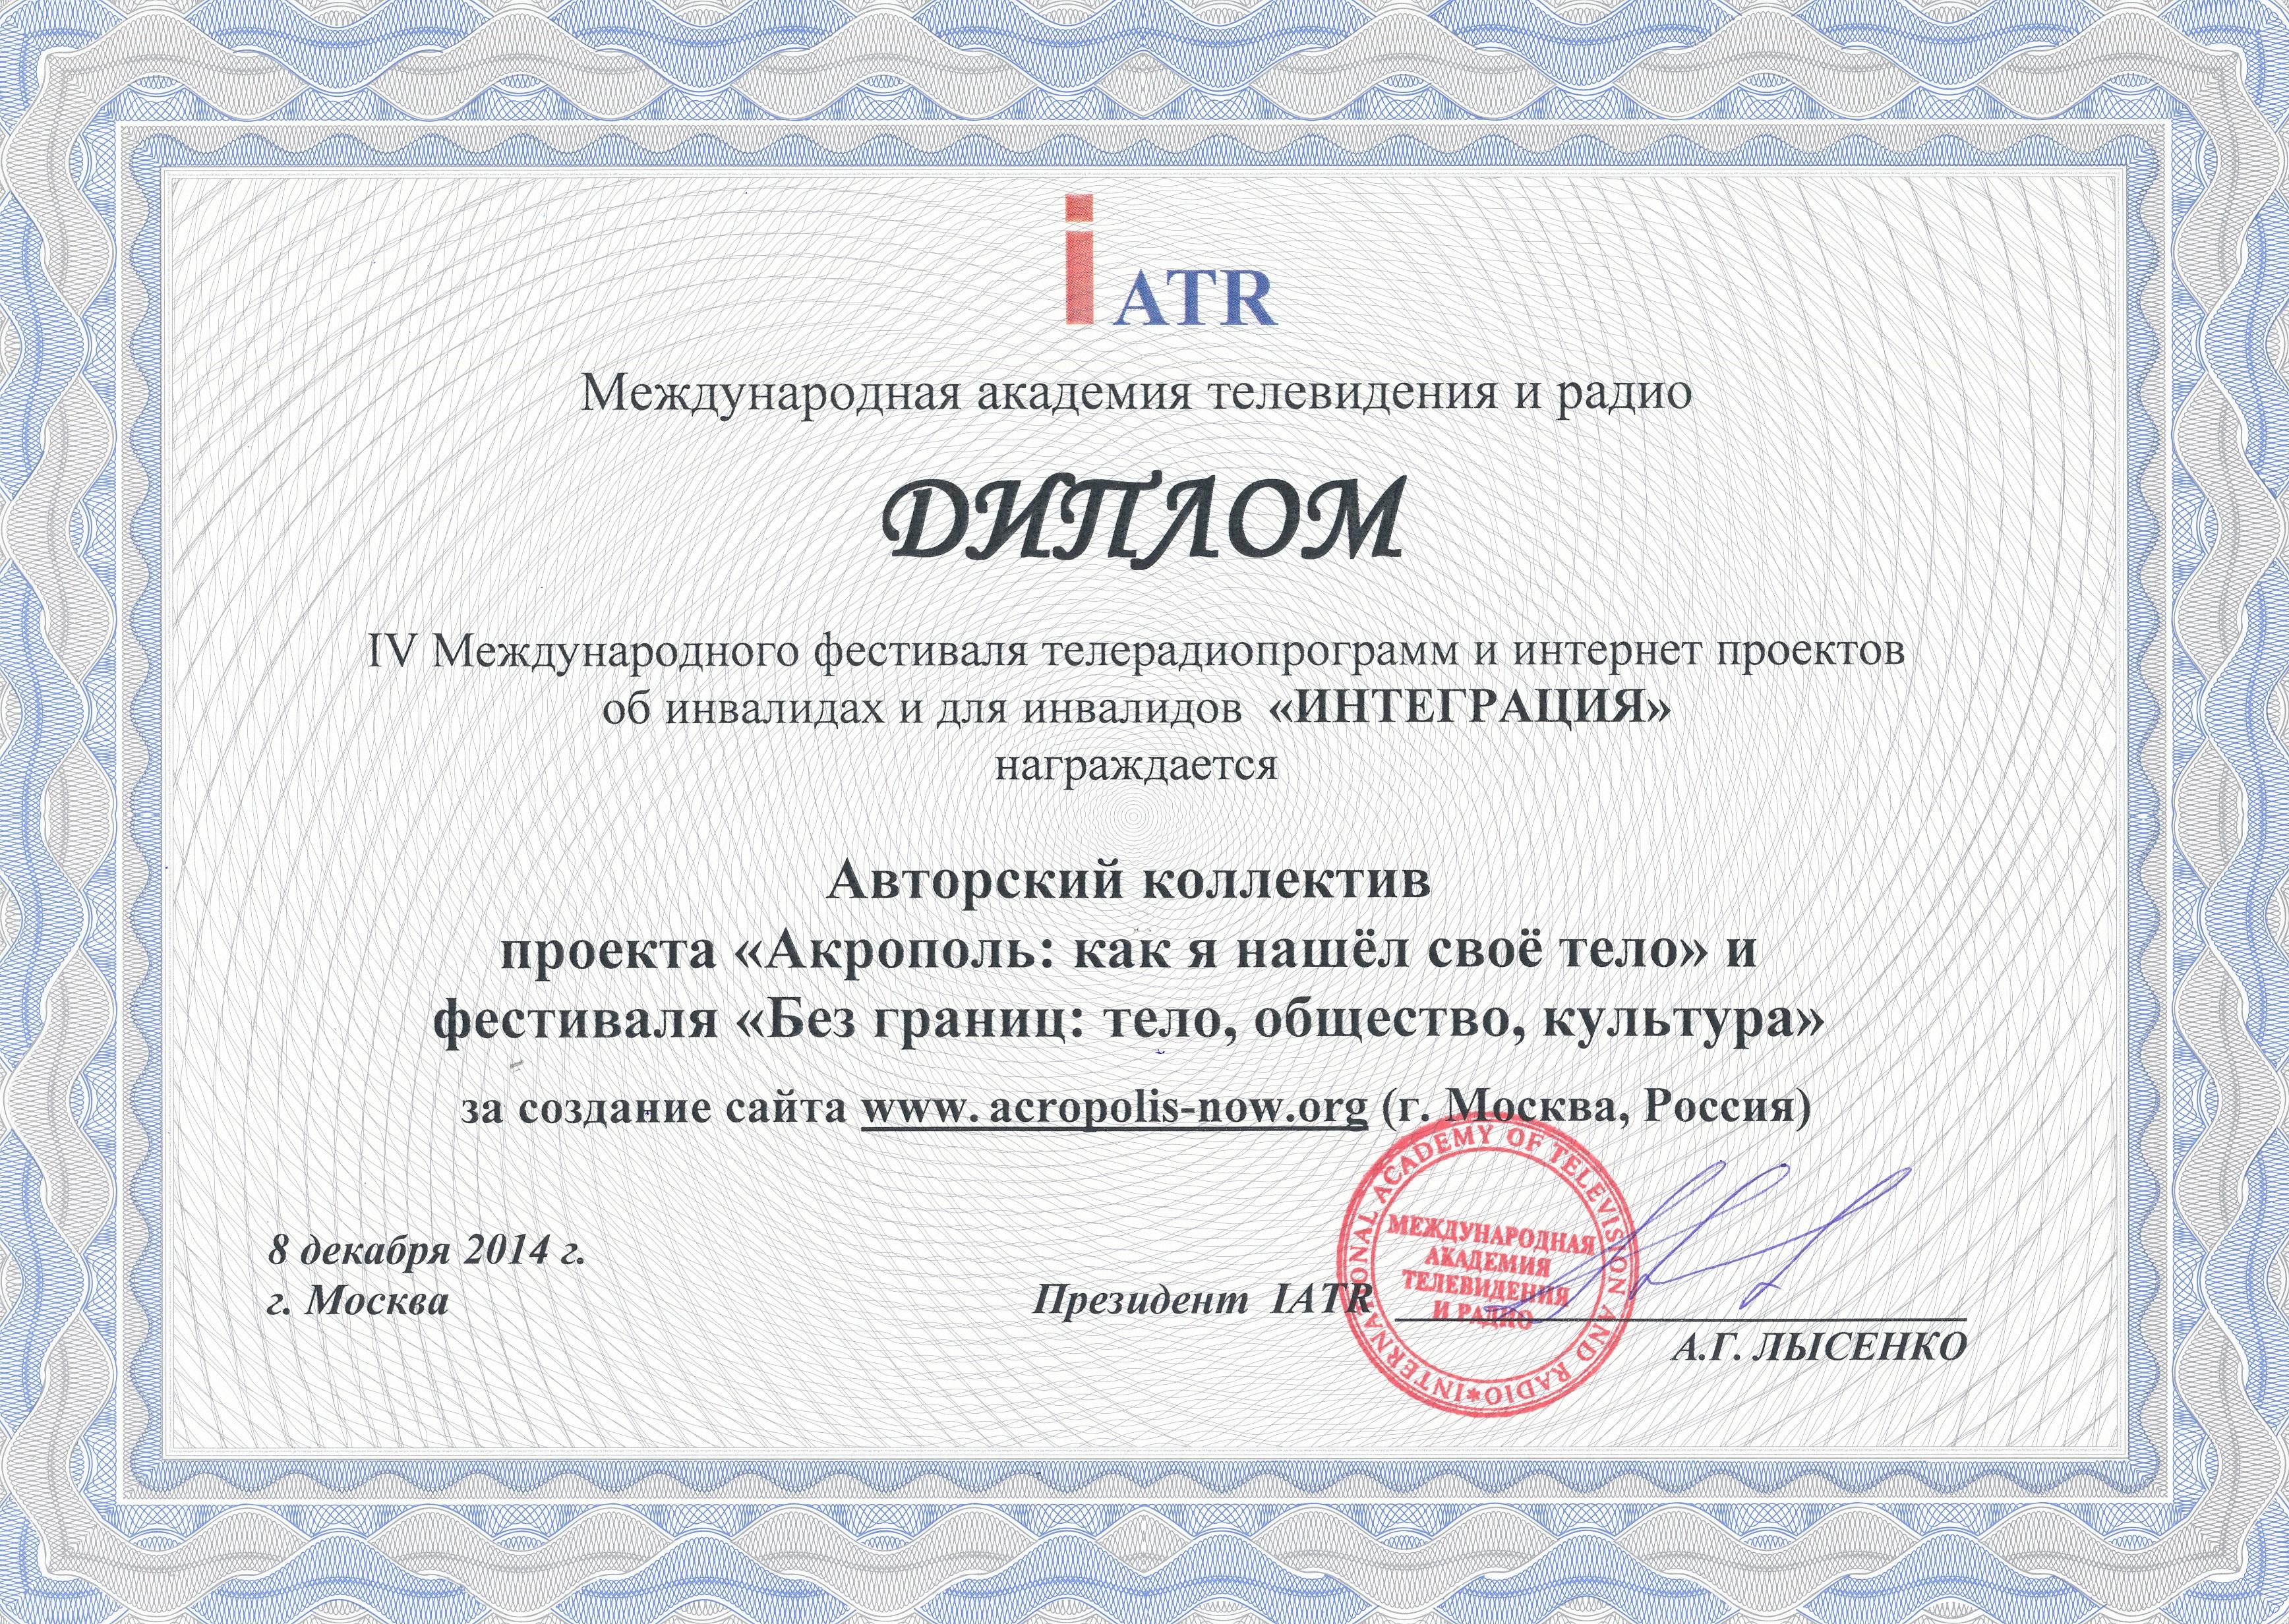 iATR Diplom